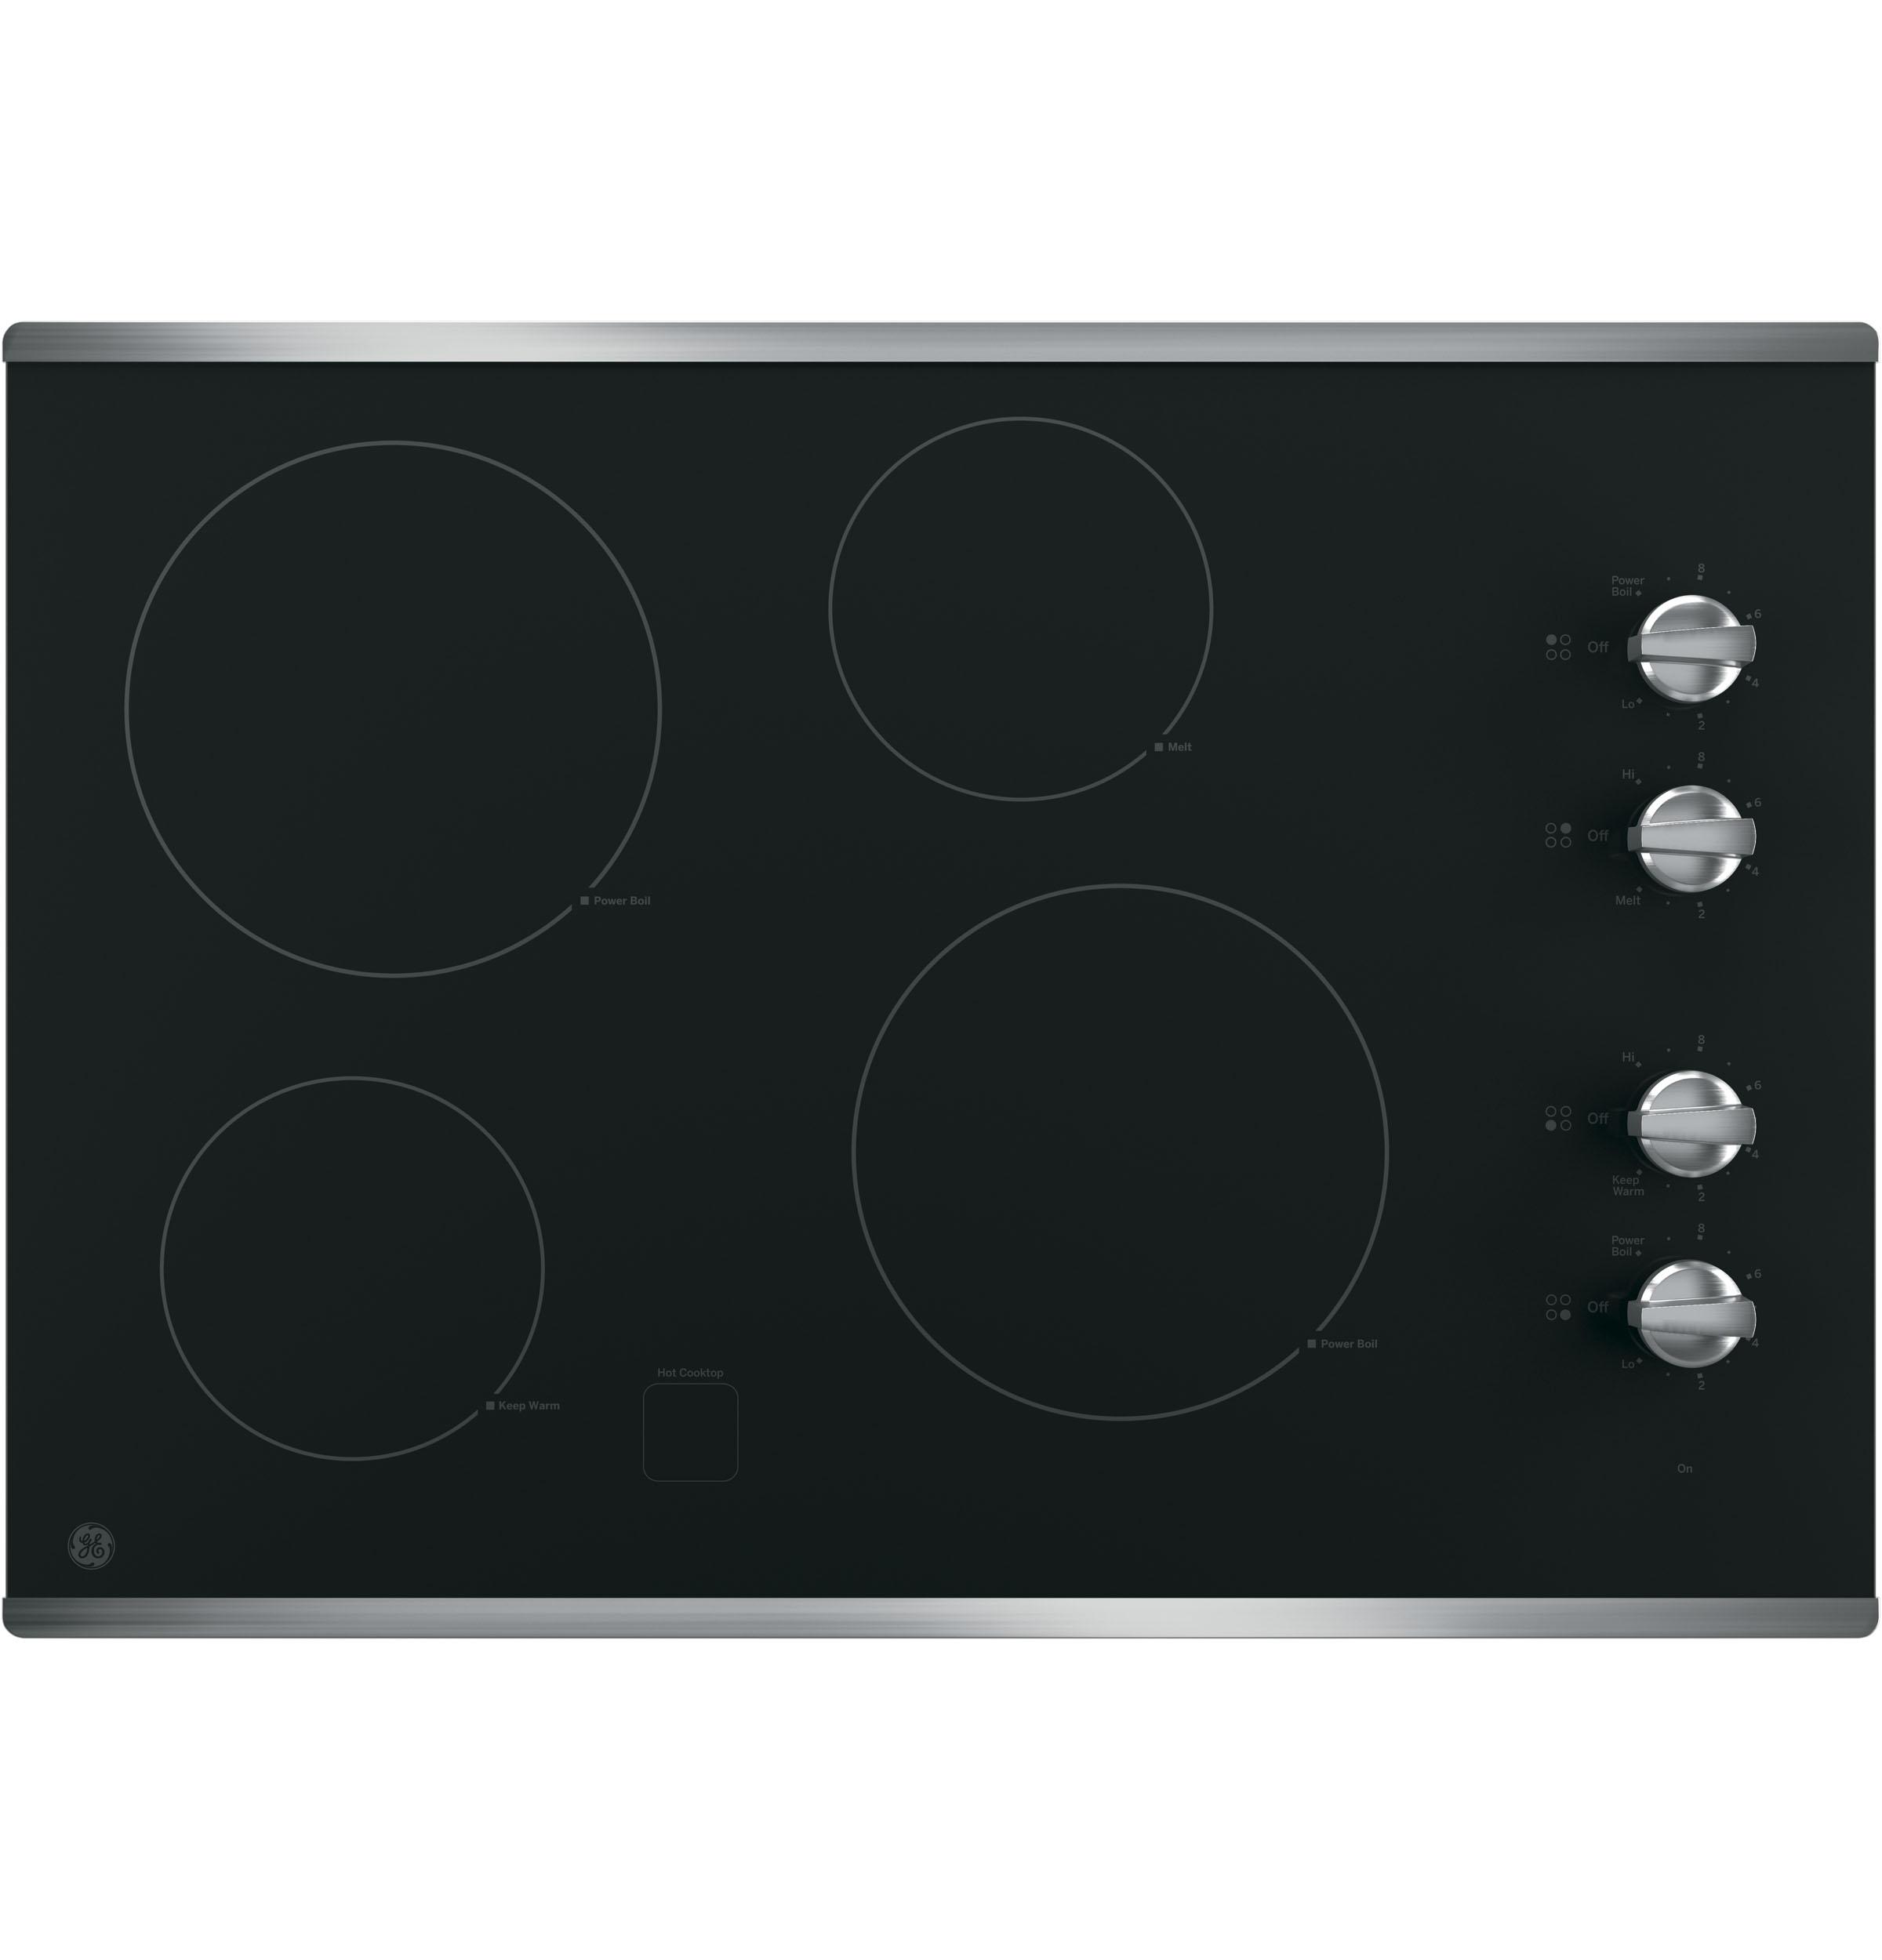 22832 – Stainless Steel Cooktop – JP3030SJSS – HR